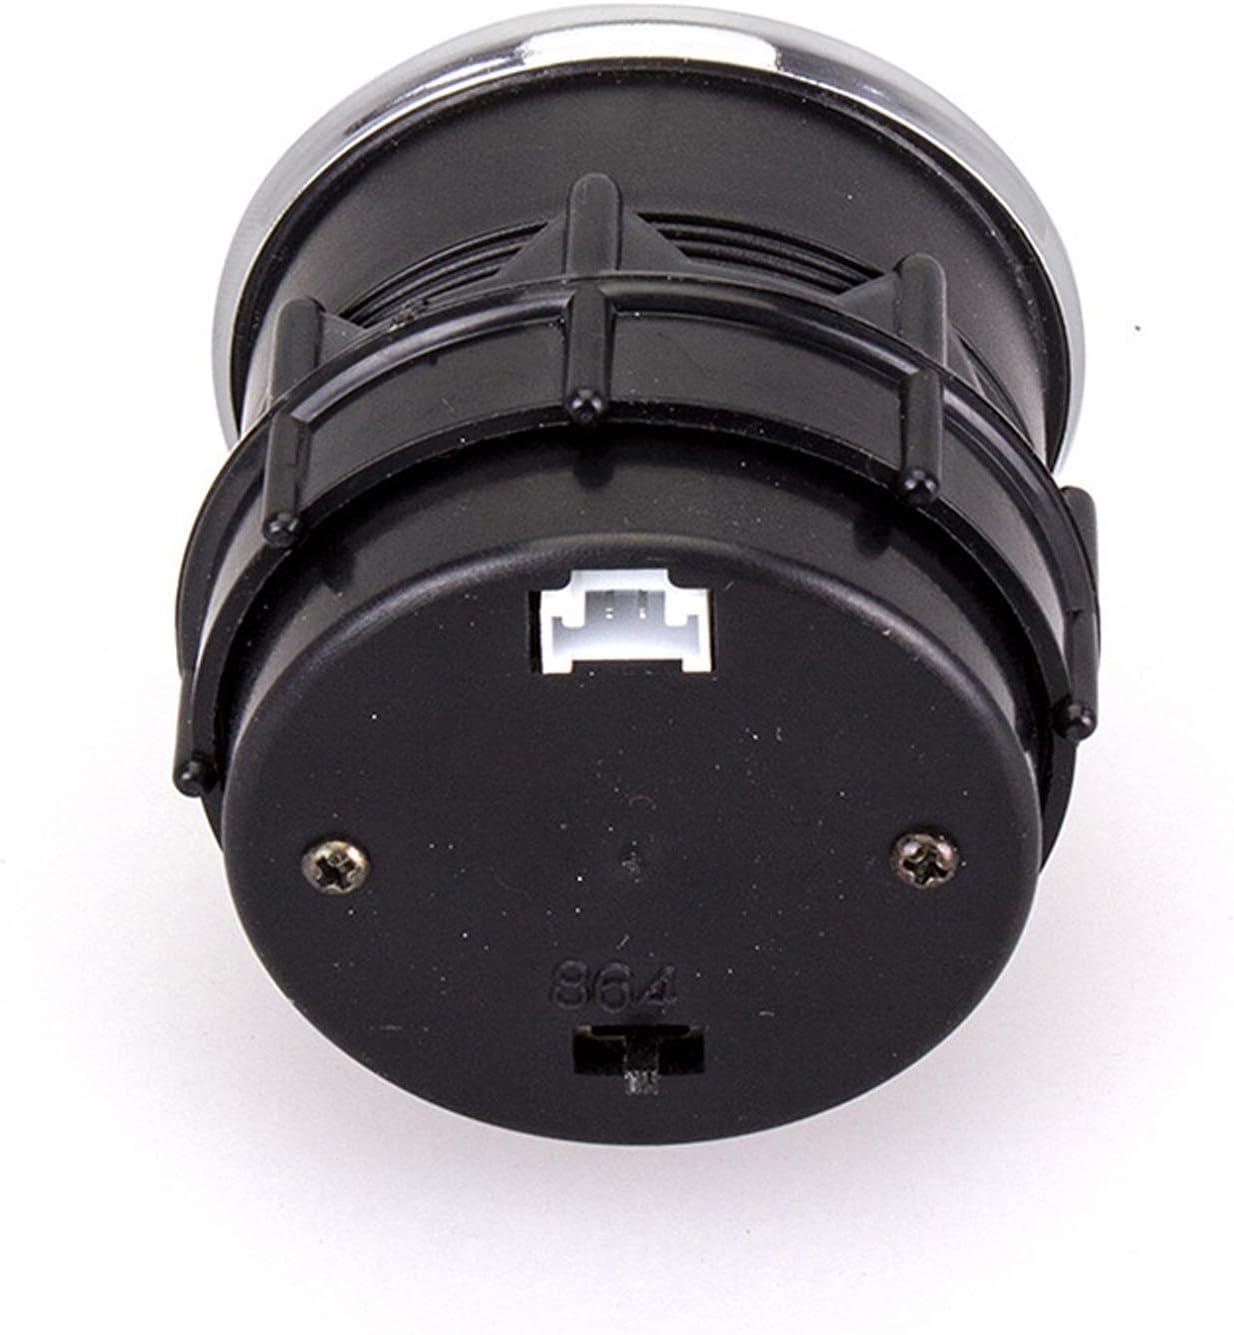 CKQ-KQ Instrument panel 52mm Oil Pressure Gauge 0~100psi With Sensor Oil Press Gauge Car Meter For engines ships modified cars